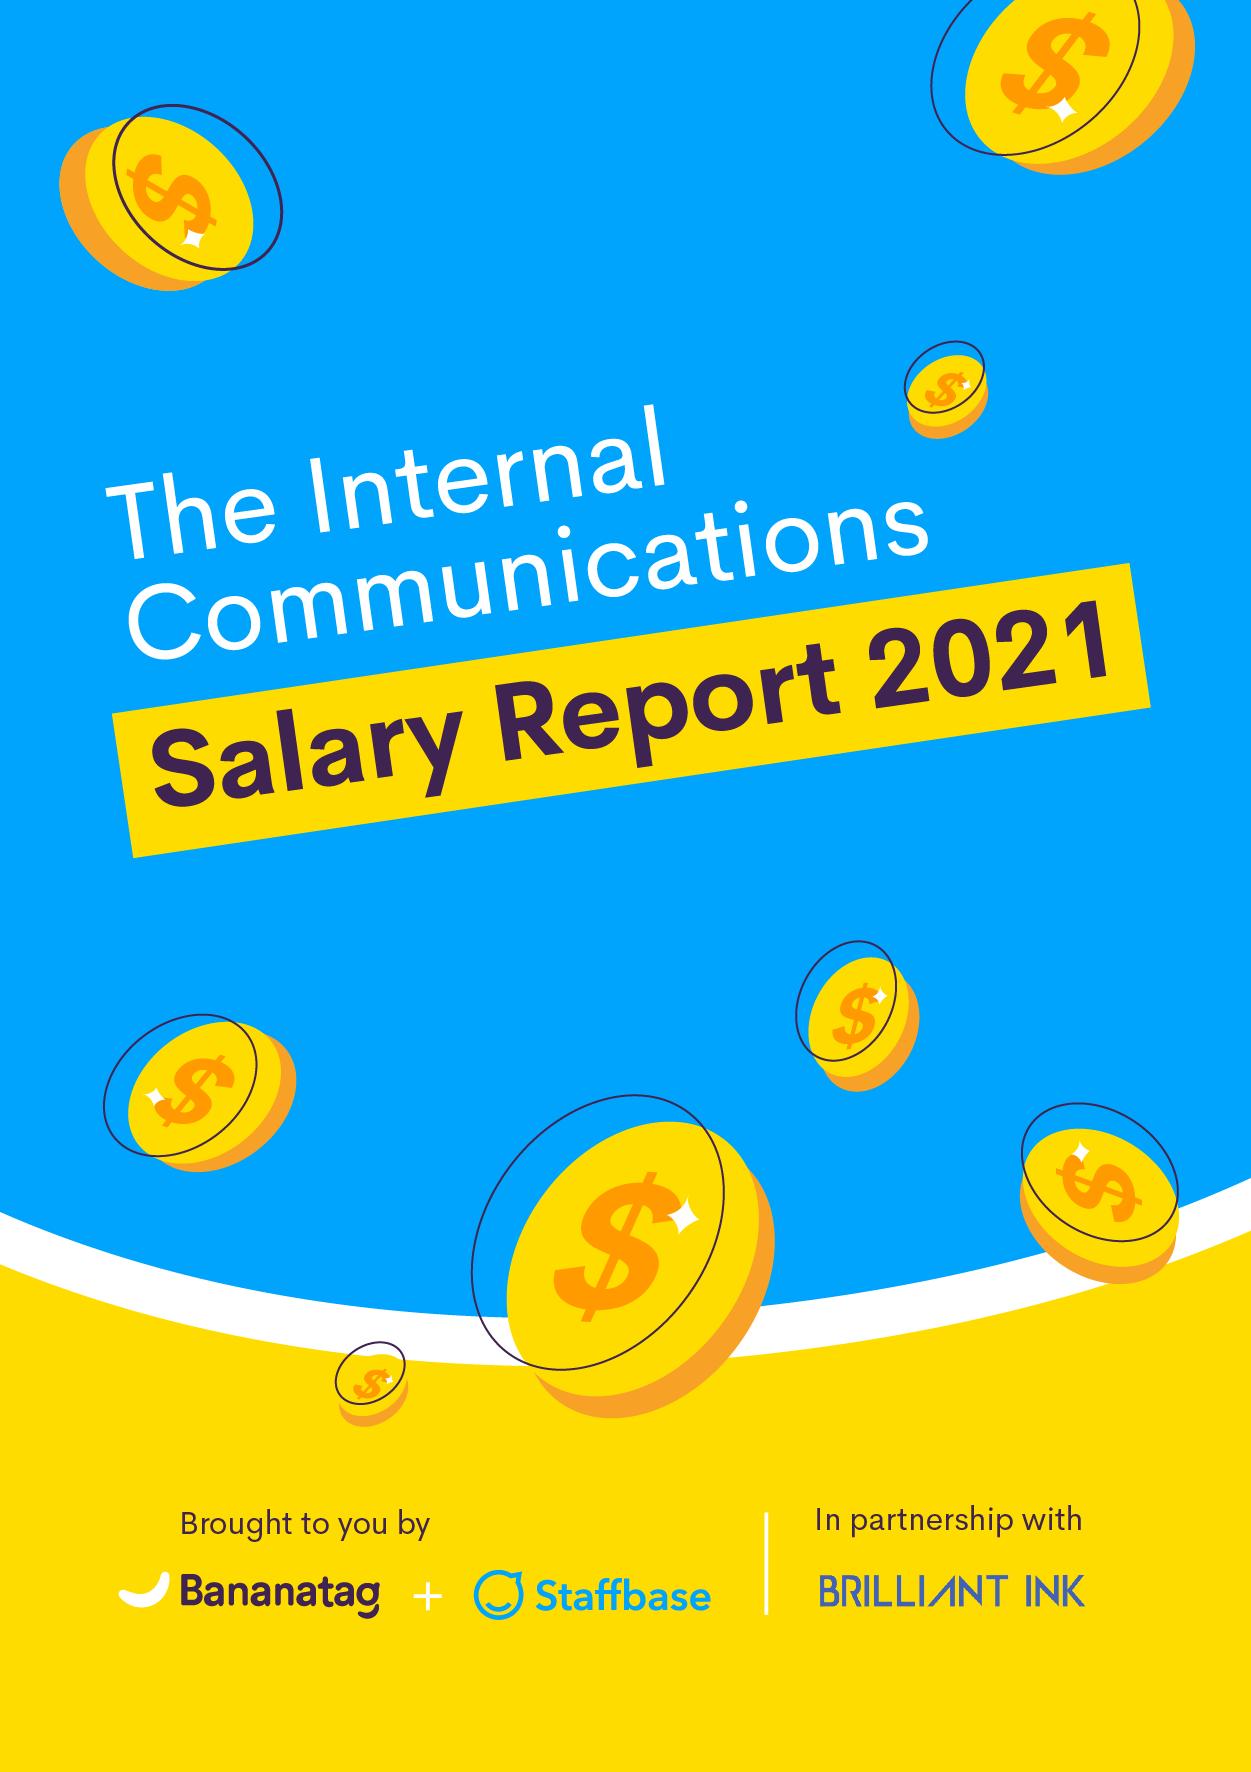 internal_communications_salary_report